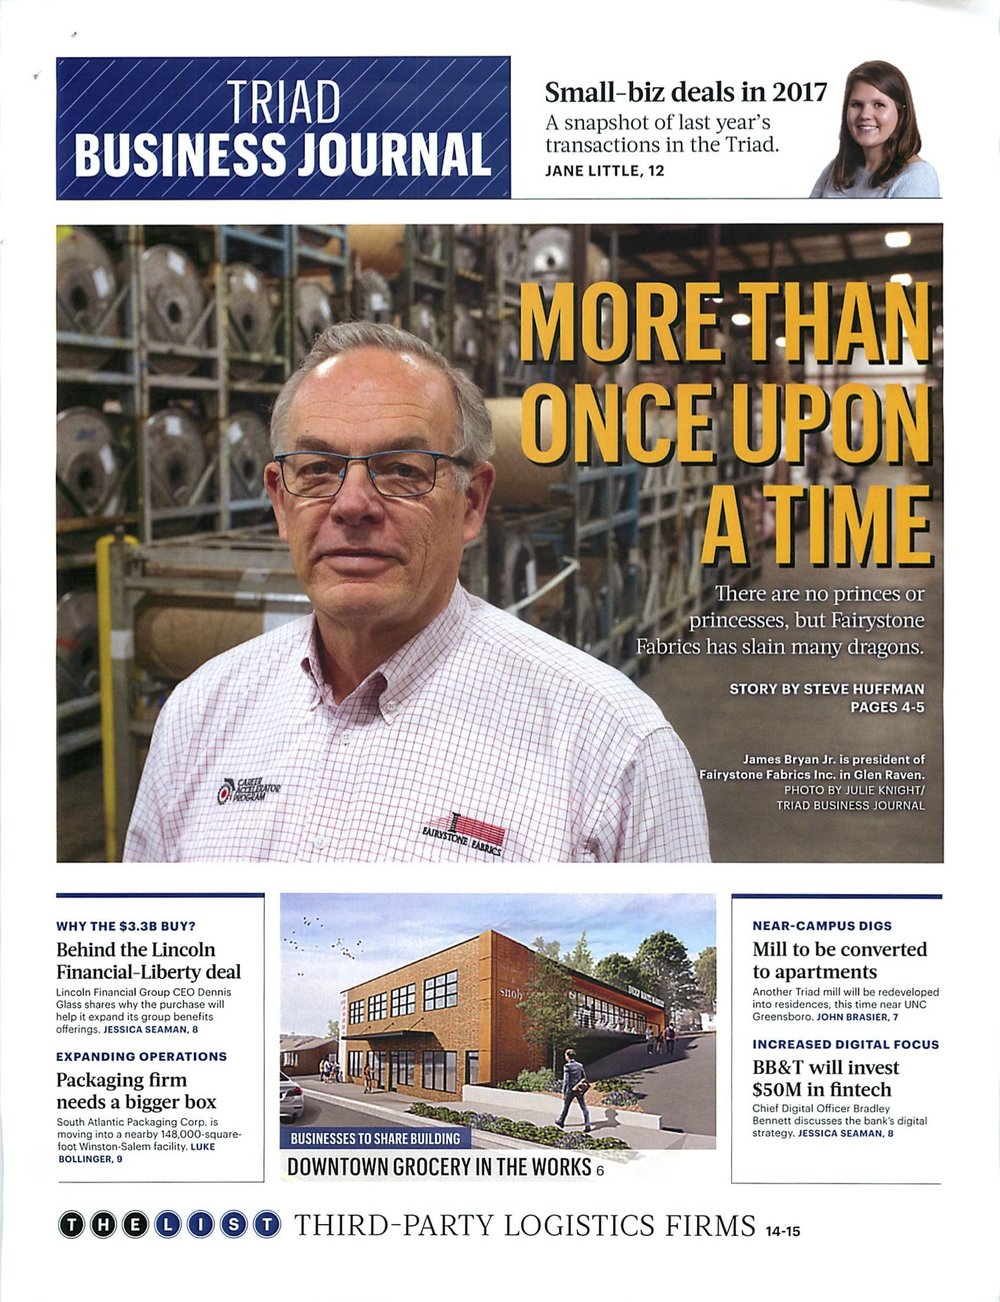 Triad Business Journal_Fairystone Fabrics page 1.jpg